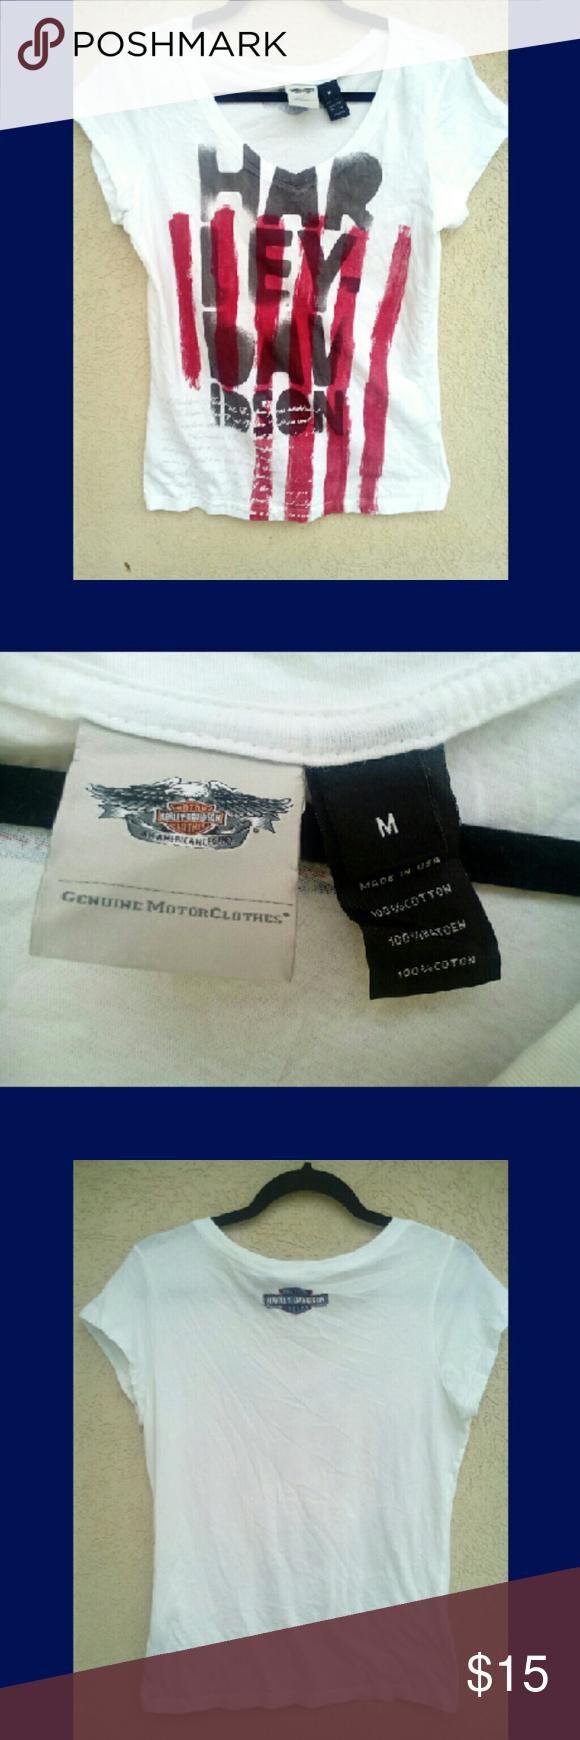 Genuine Harley Davidson Patriotic Graphic Tee Graphic Tees Harley Davidson Clothes Design